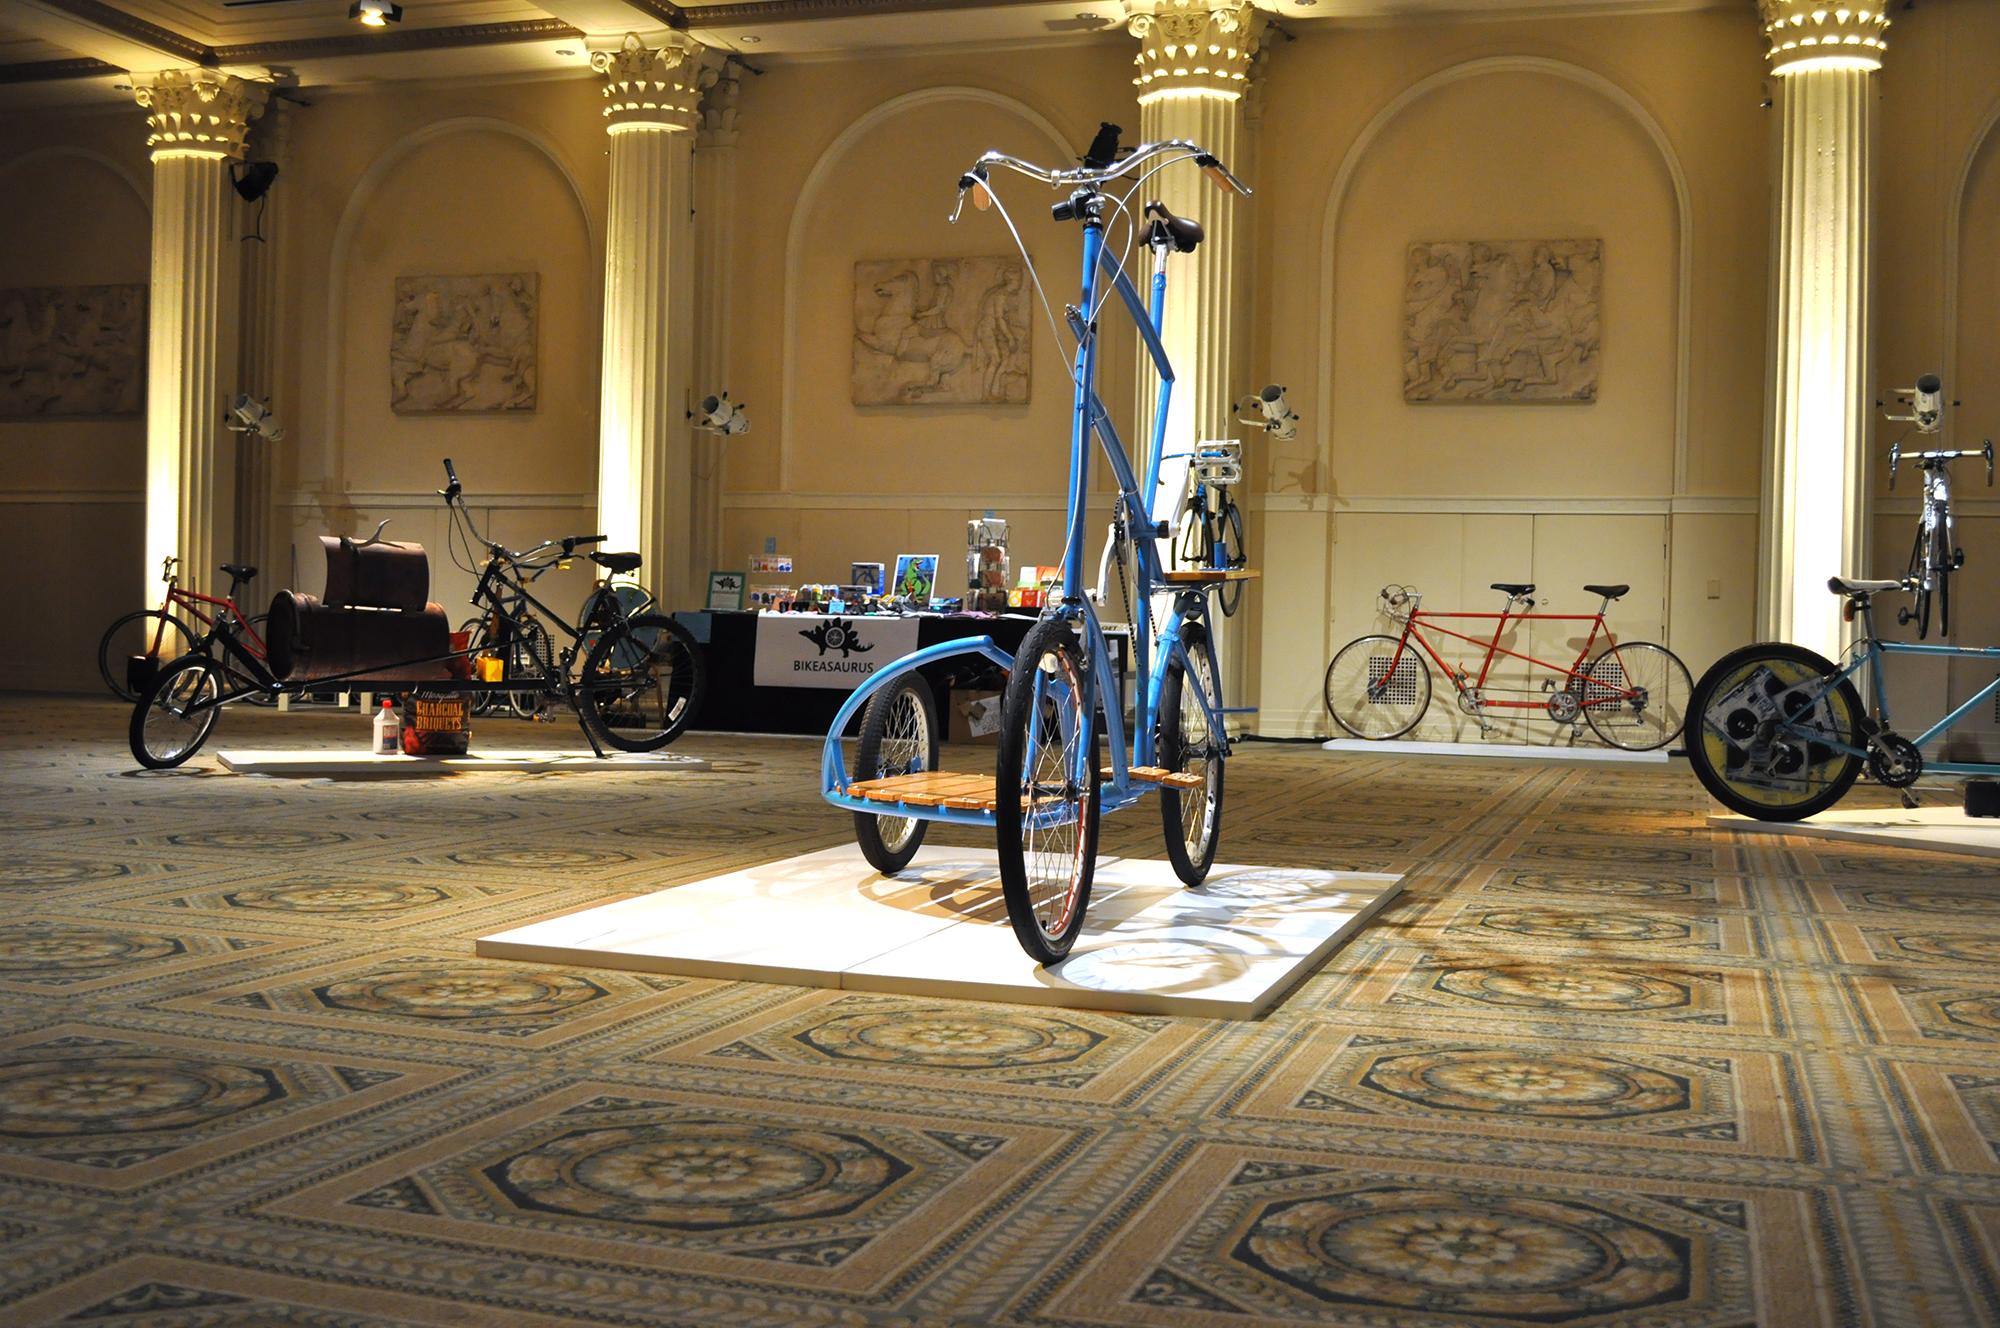 Portland Art Museum Sidecar Tallbike Bicycle bigtop